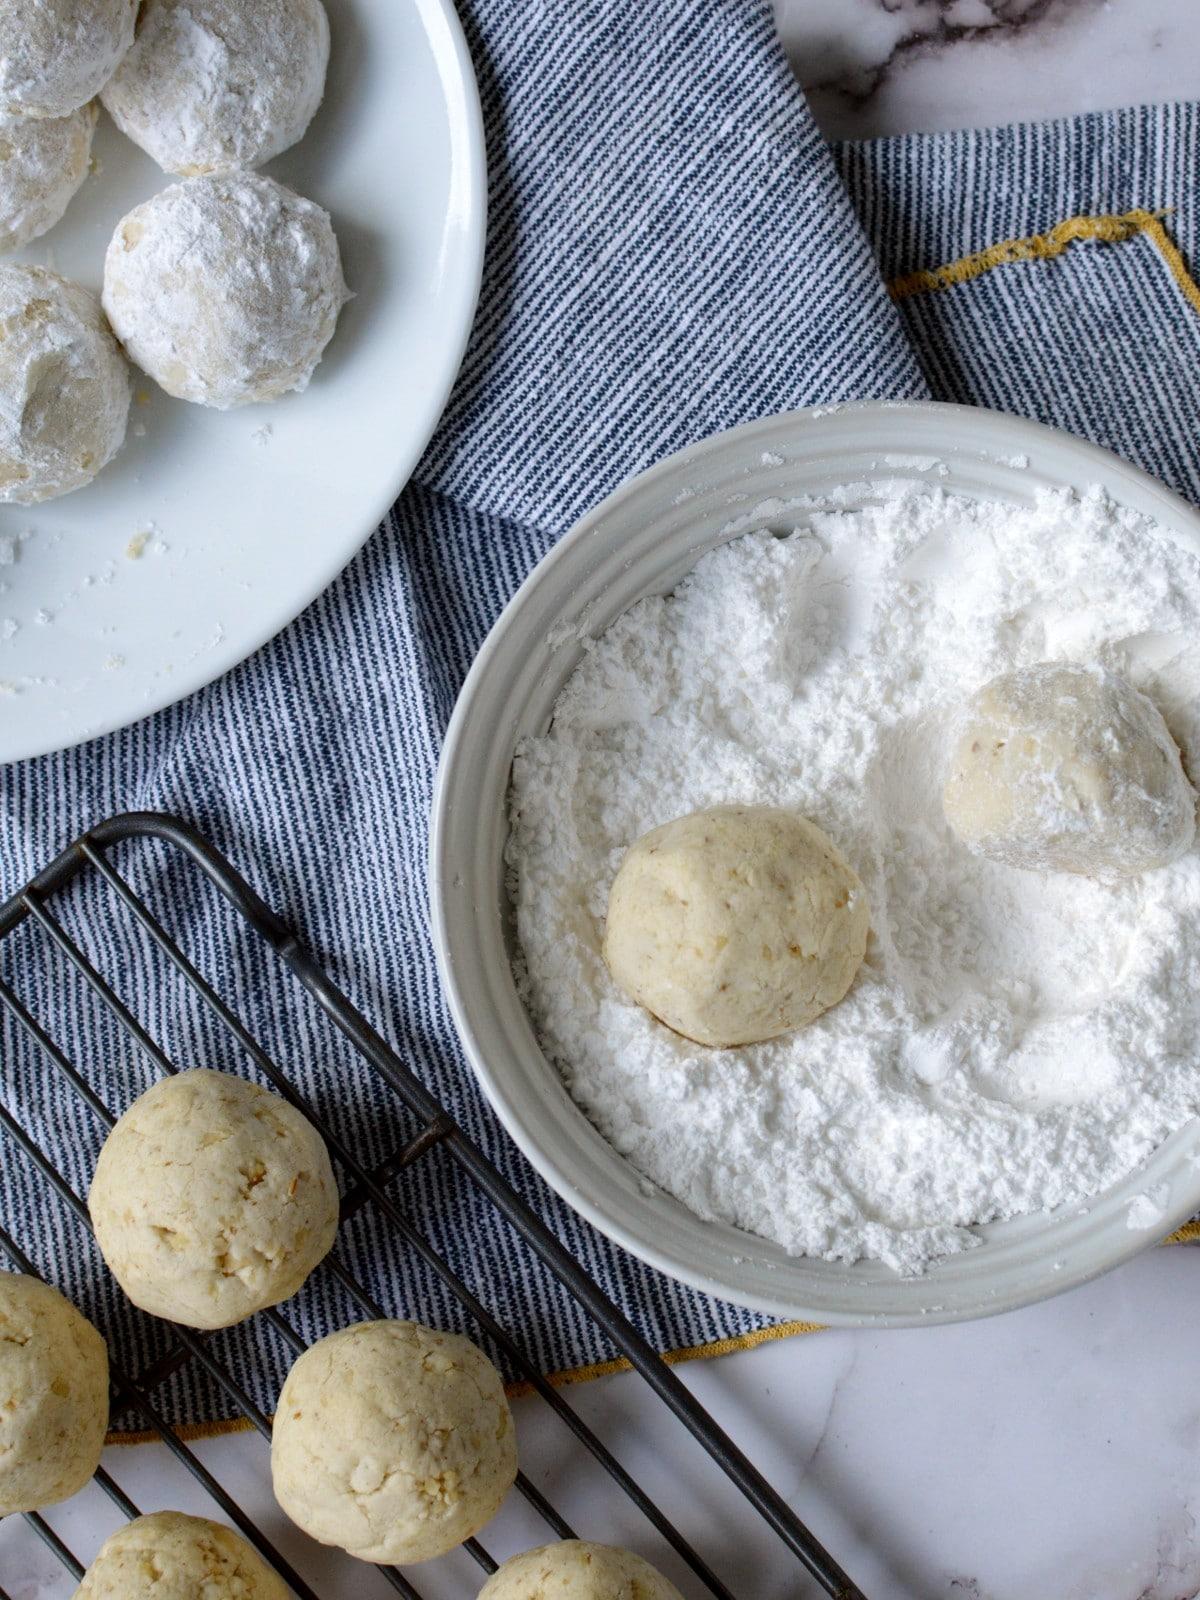 rolling cookies in powdered sugar